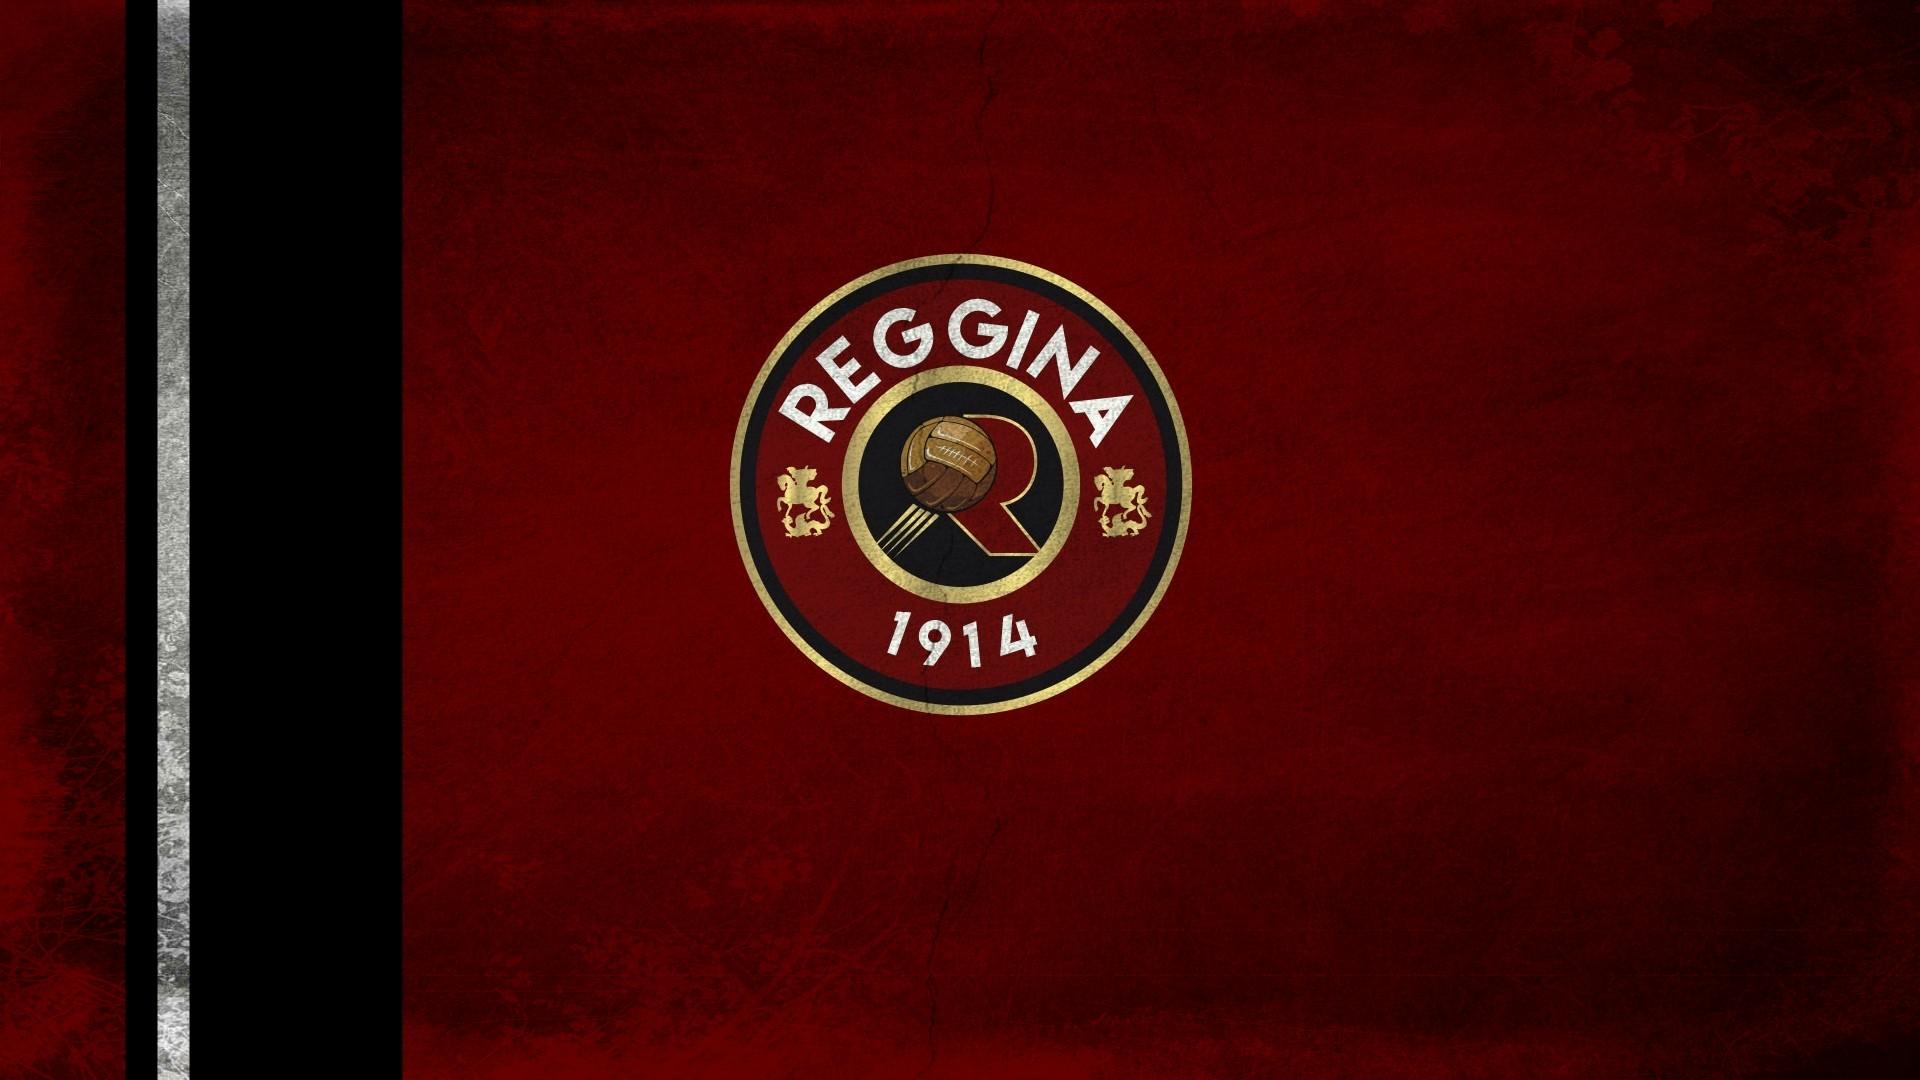 General 1920x1080 Reggina 1914 Calabria Reggio di Calabria Italy grunge soccer amaranth black football stadium